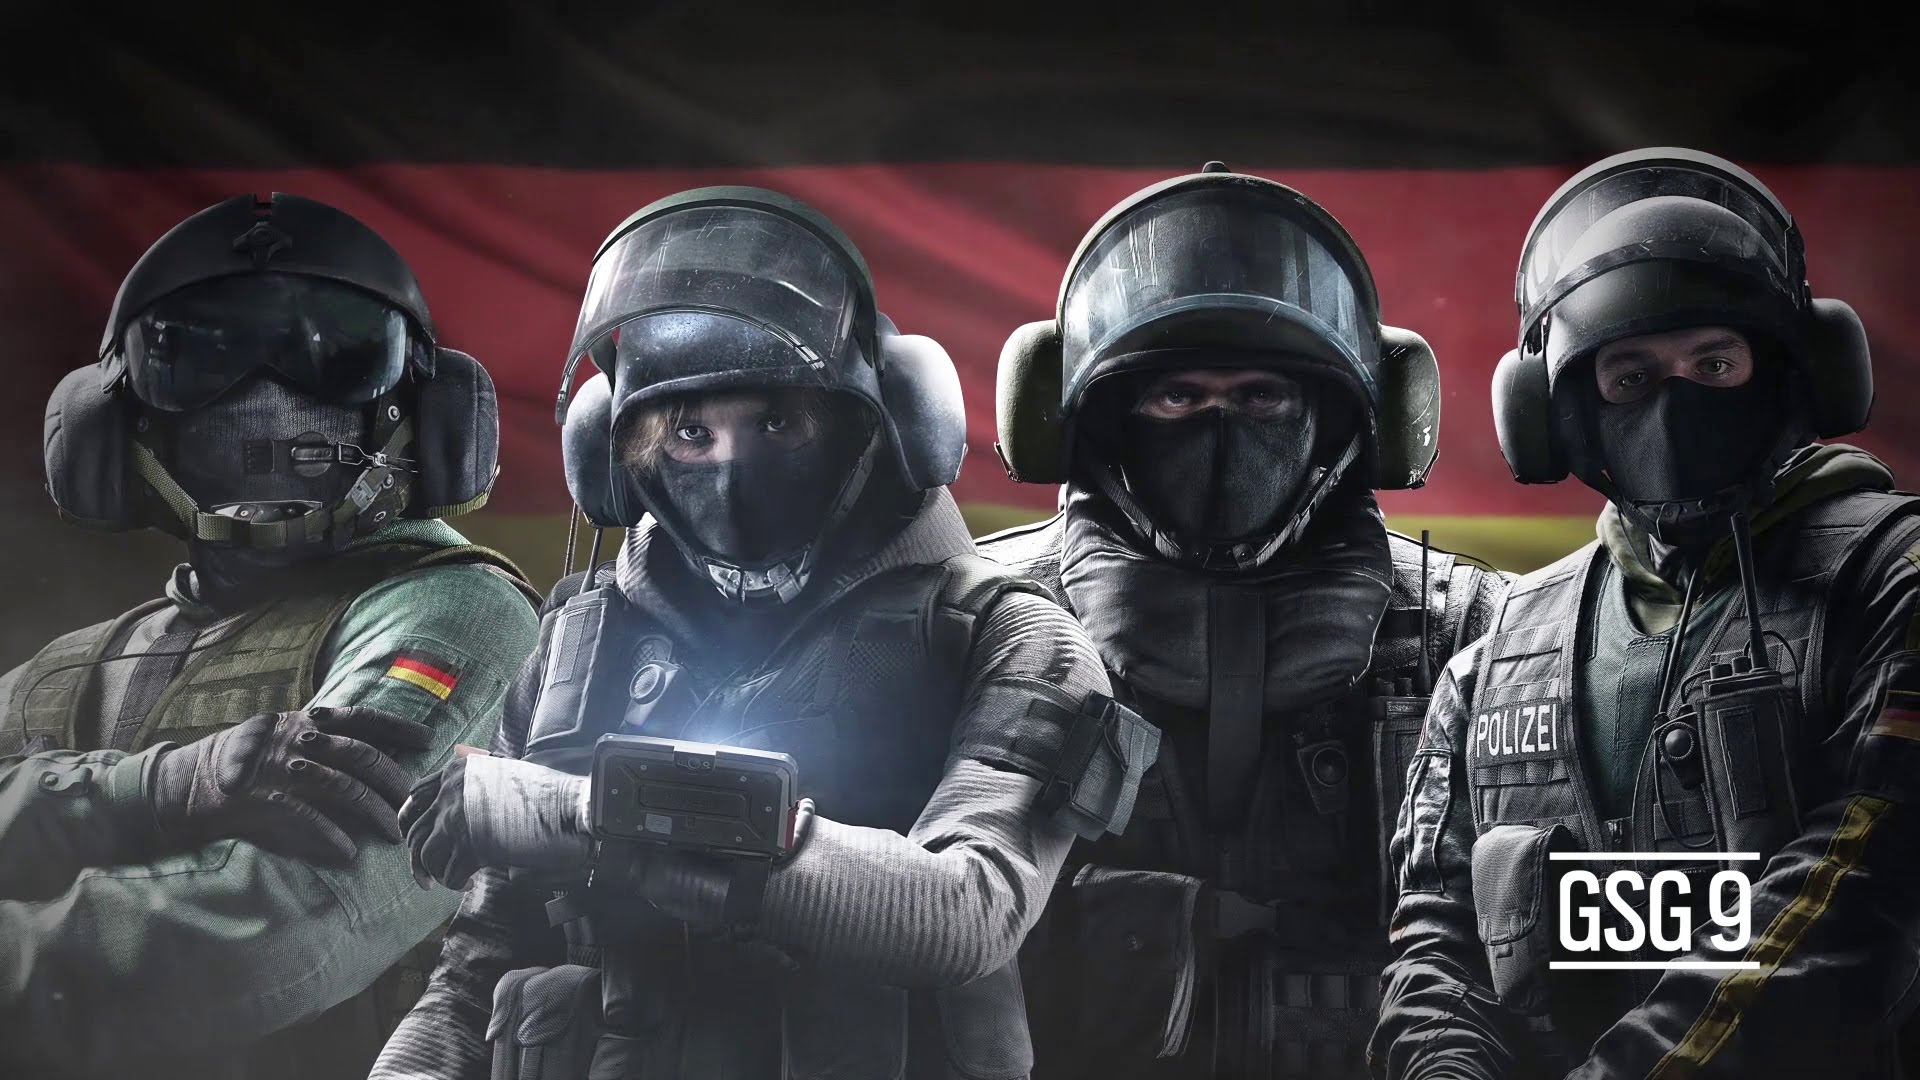 Rainbow Six Siege Gsg 9 Operators Bandit Blitz Iq Jager